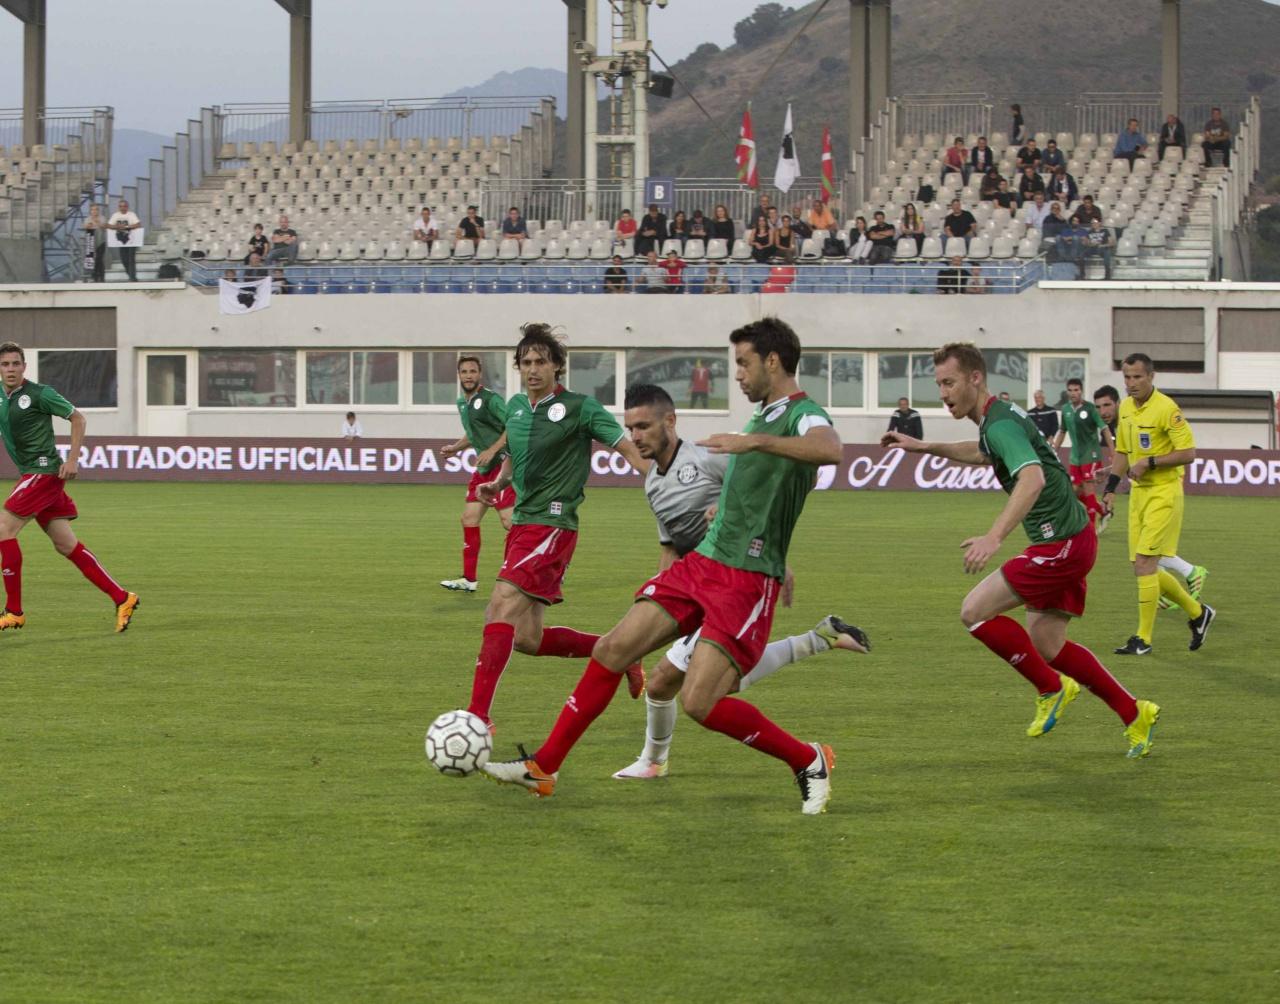 Photo www.corse.fr